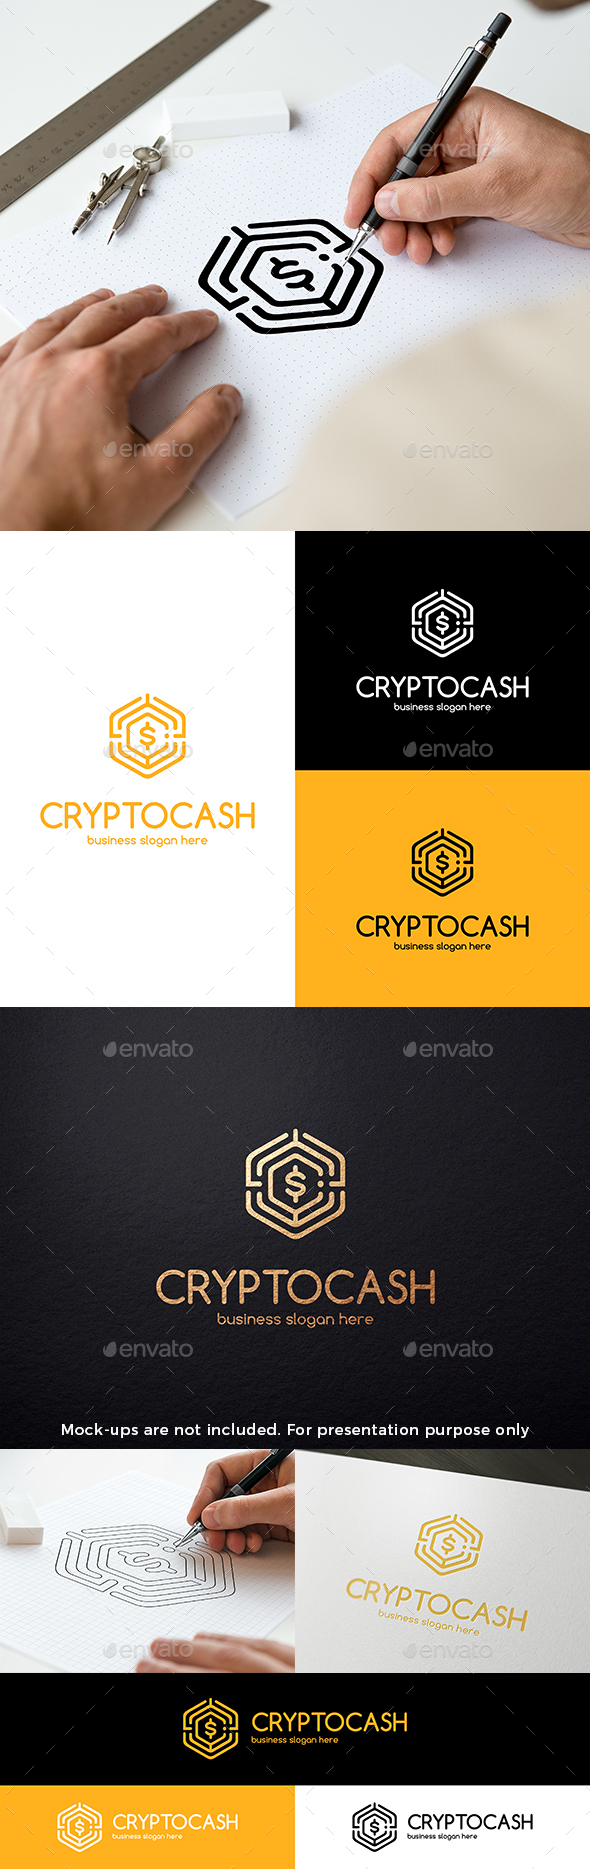 Bitcoin Crypto Currency Cash Logo